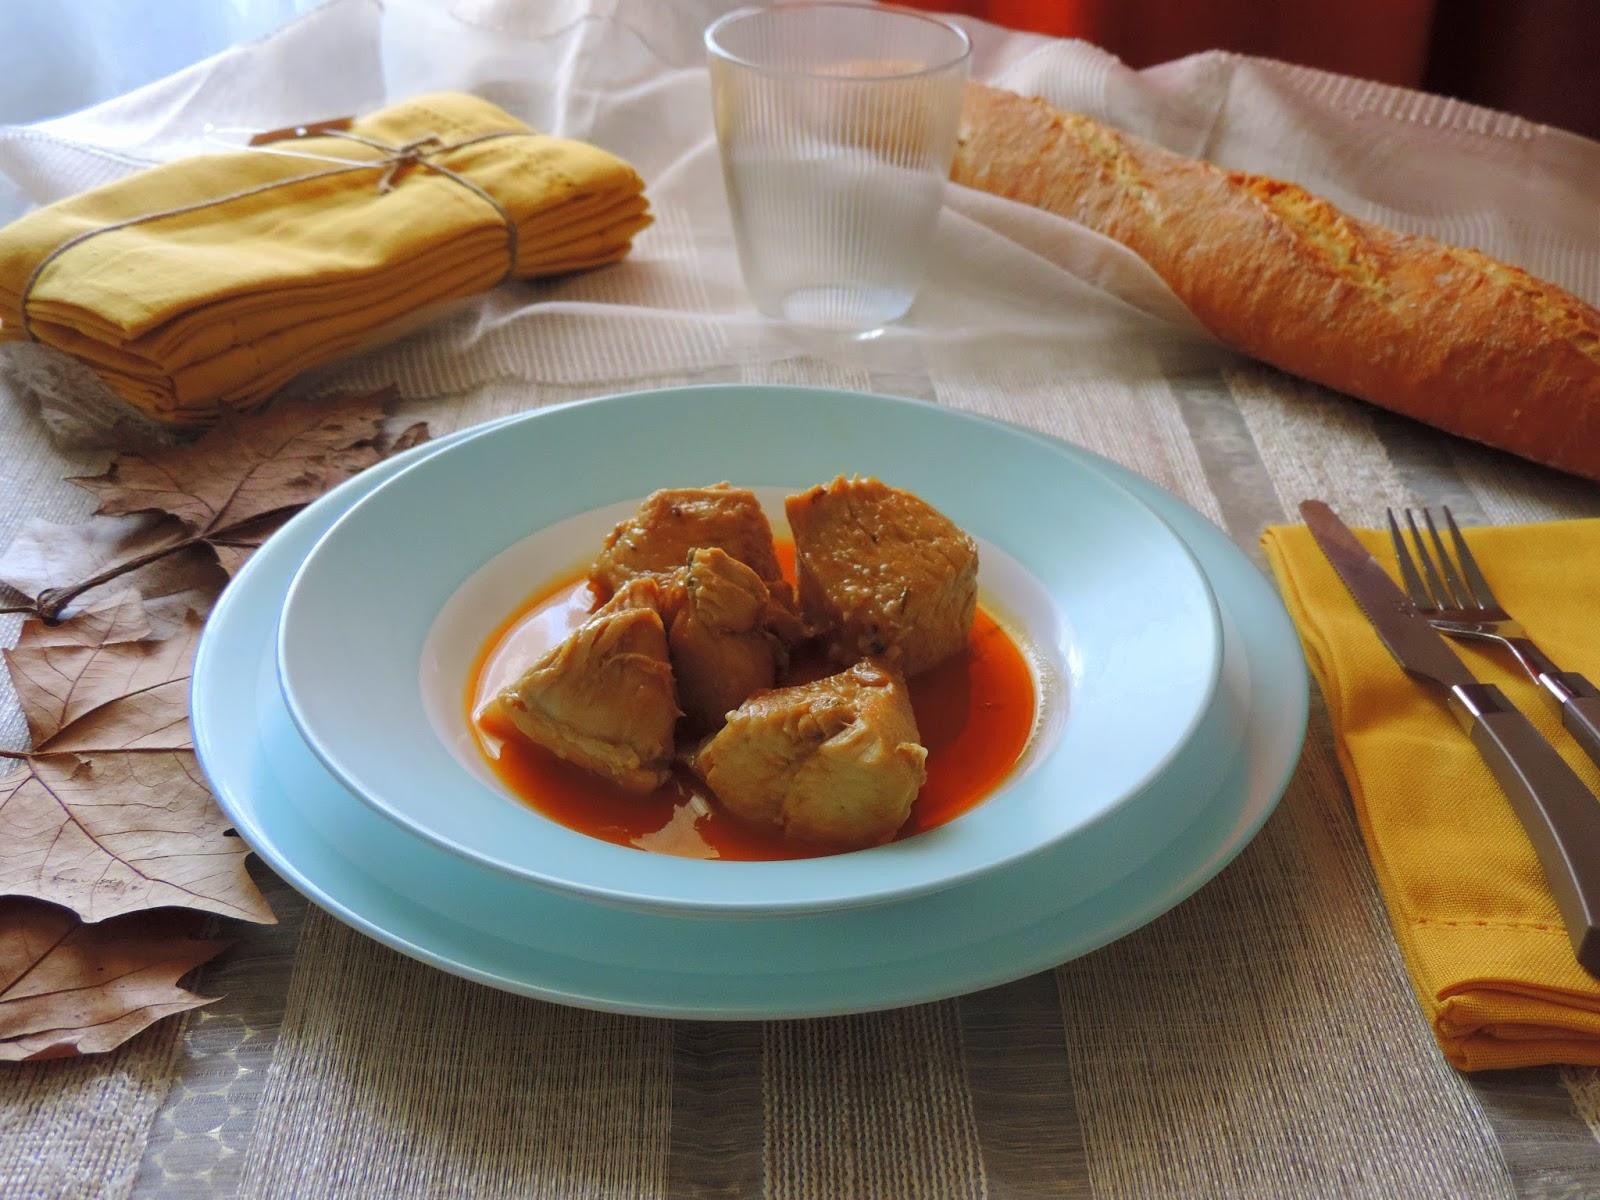 Cocinando con las chachas pollo en salsa - Como se hace pollo en salsa ...